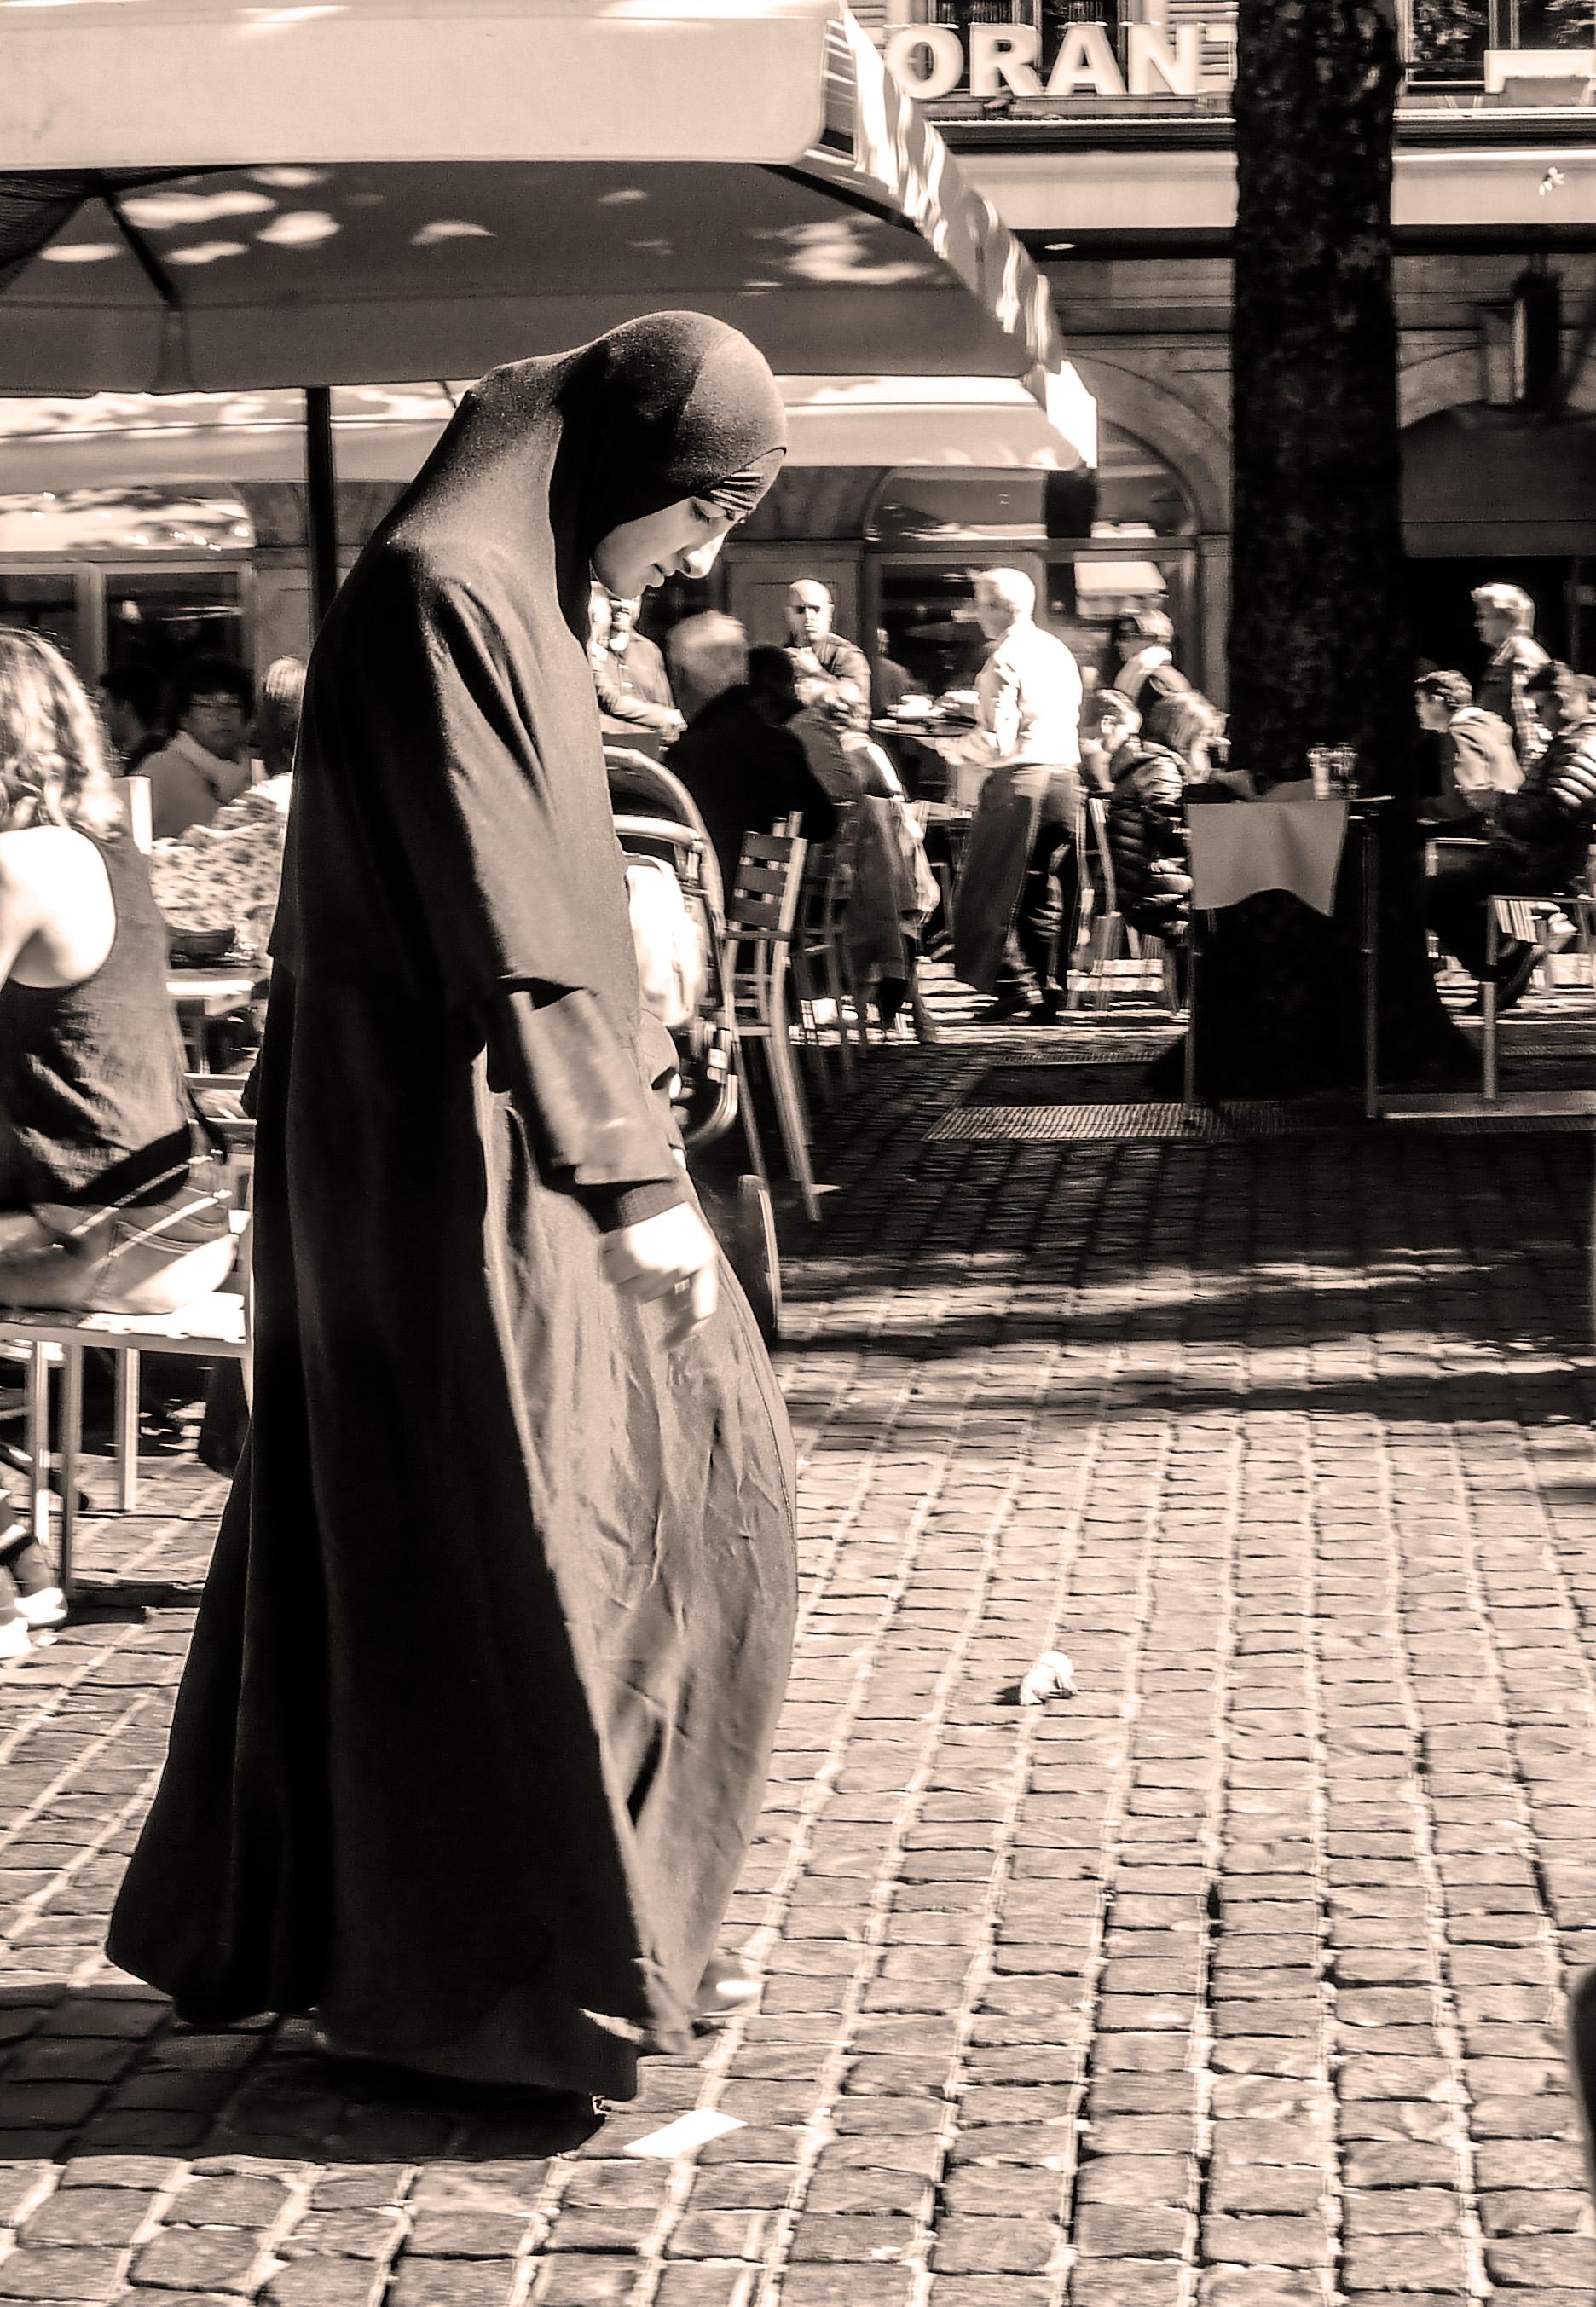 Streetphoto_Molard-1070409.jpg